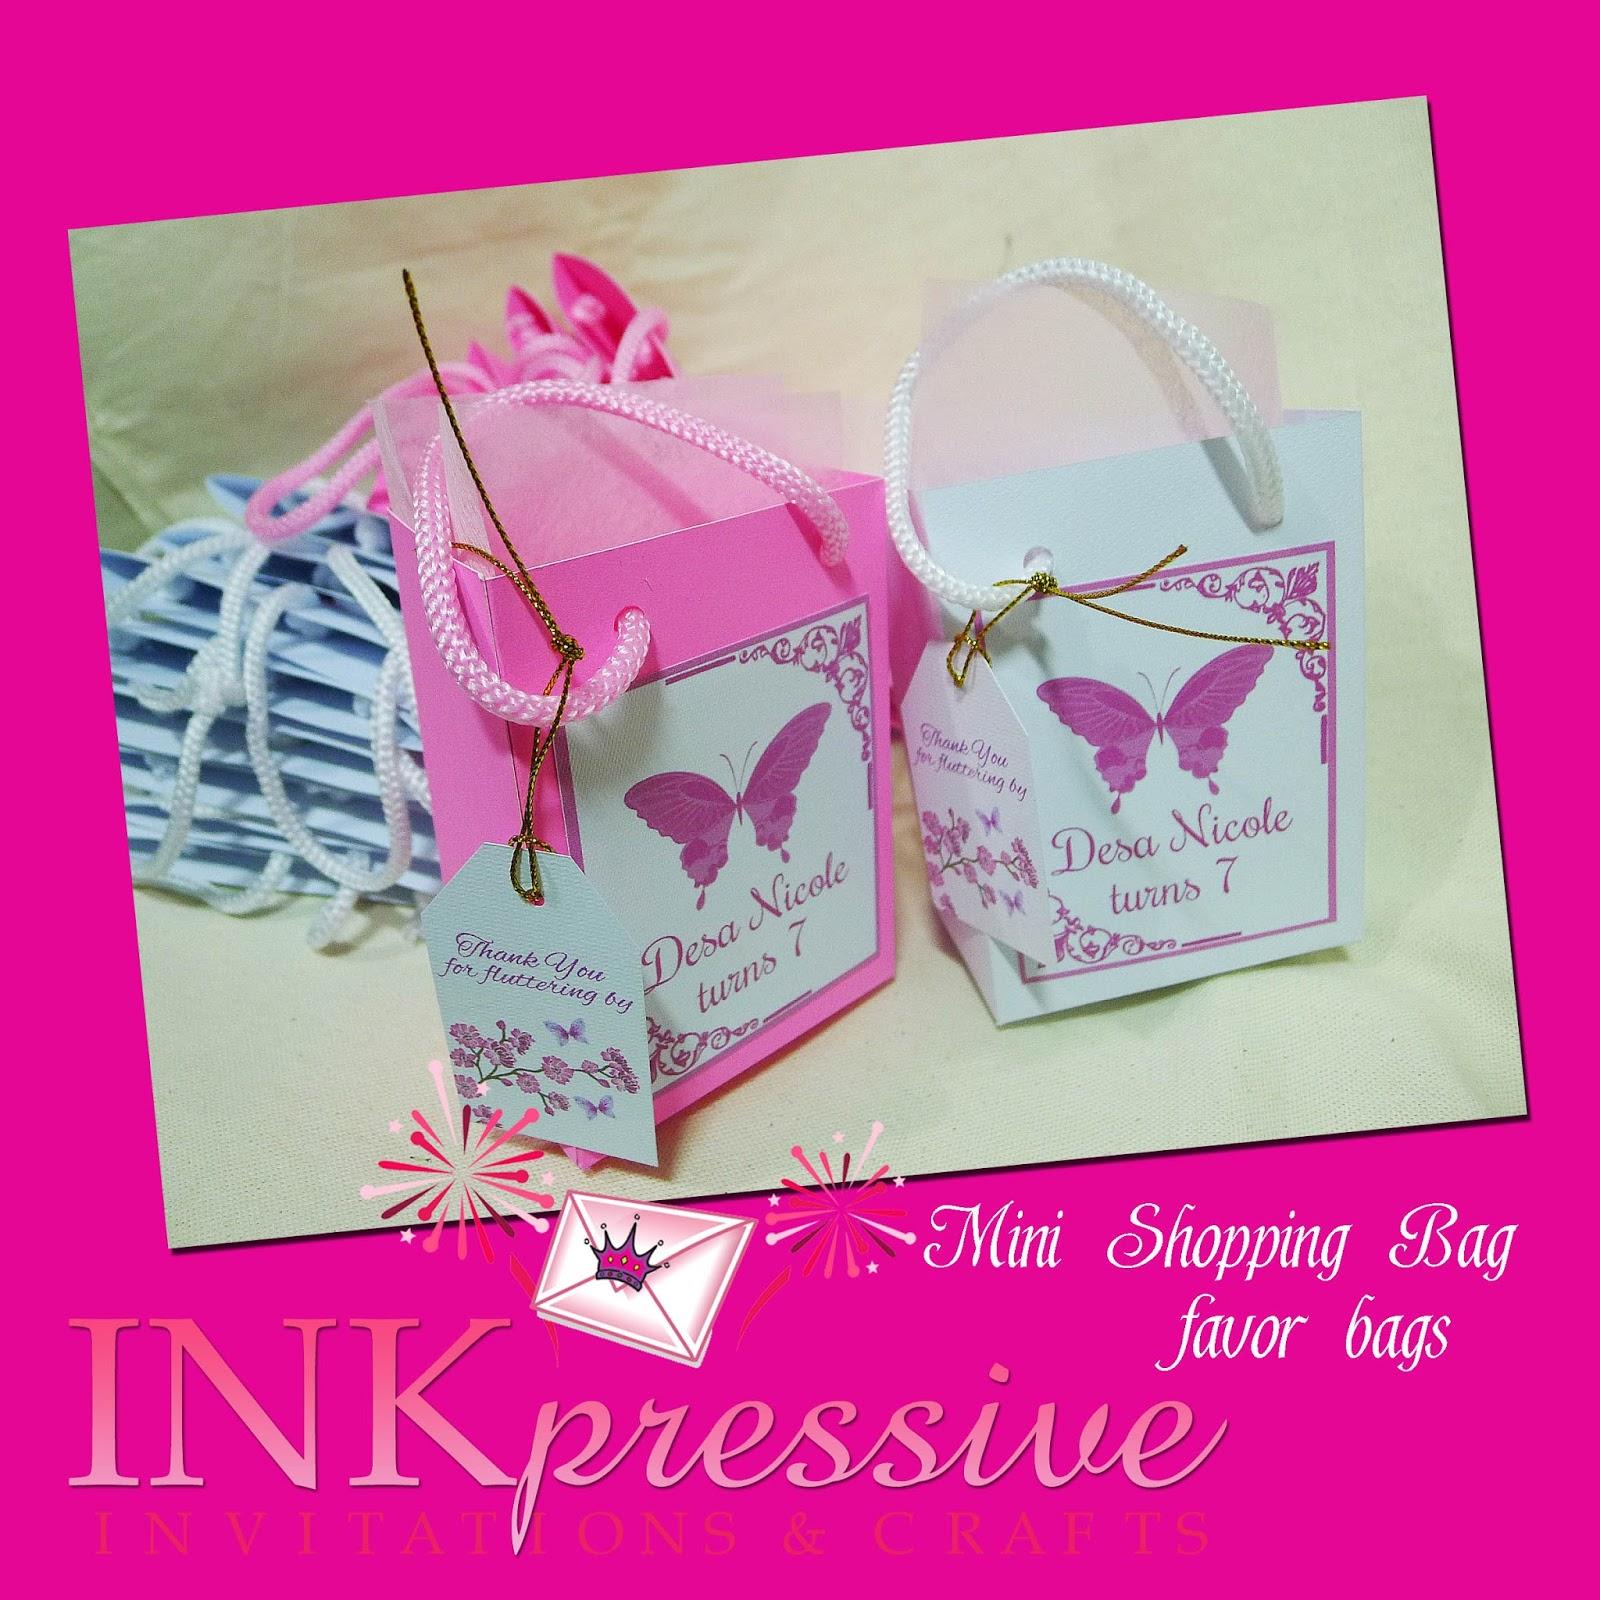 Mini Shopping Bag Favor Boxes | INKPRESSIVE INVITATIONS